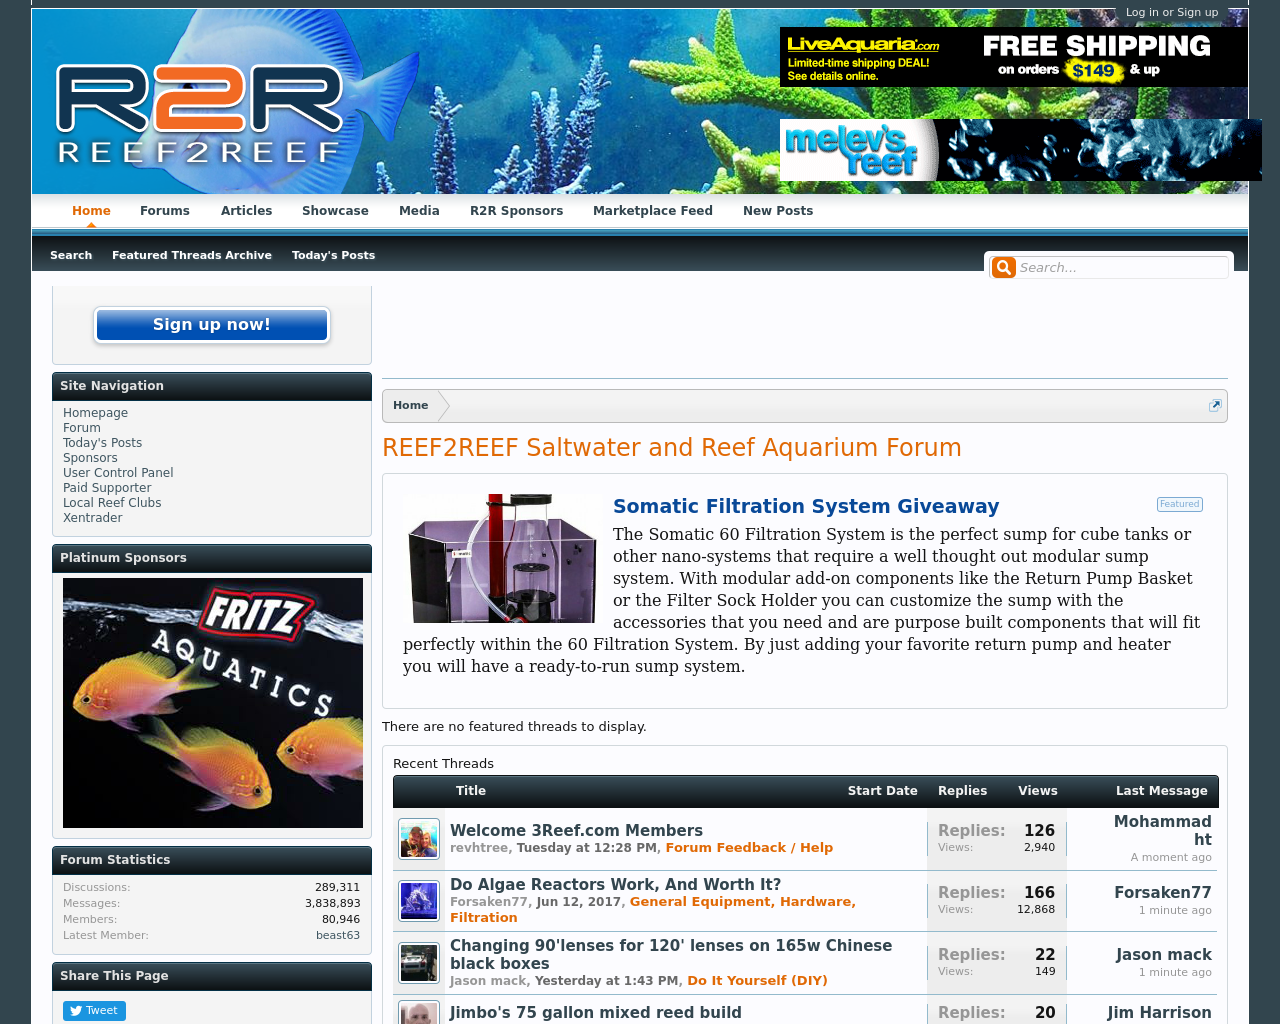 Reef2reef.com-Advertising-Reviews-Pricing